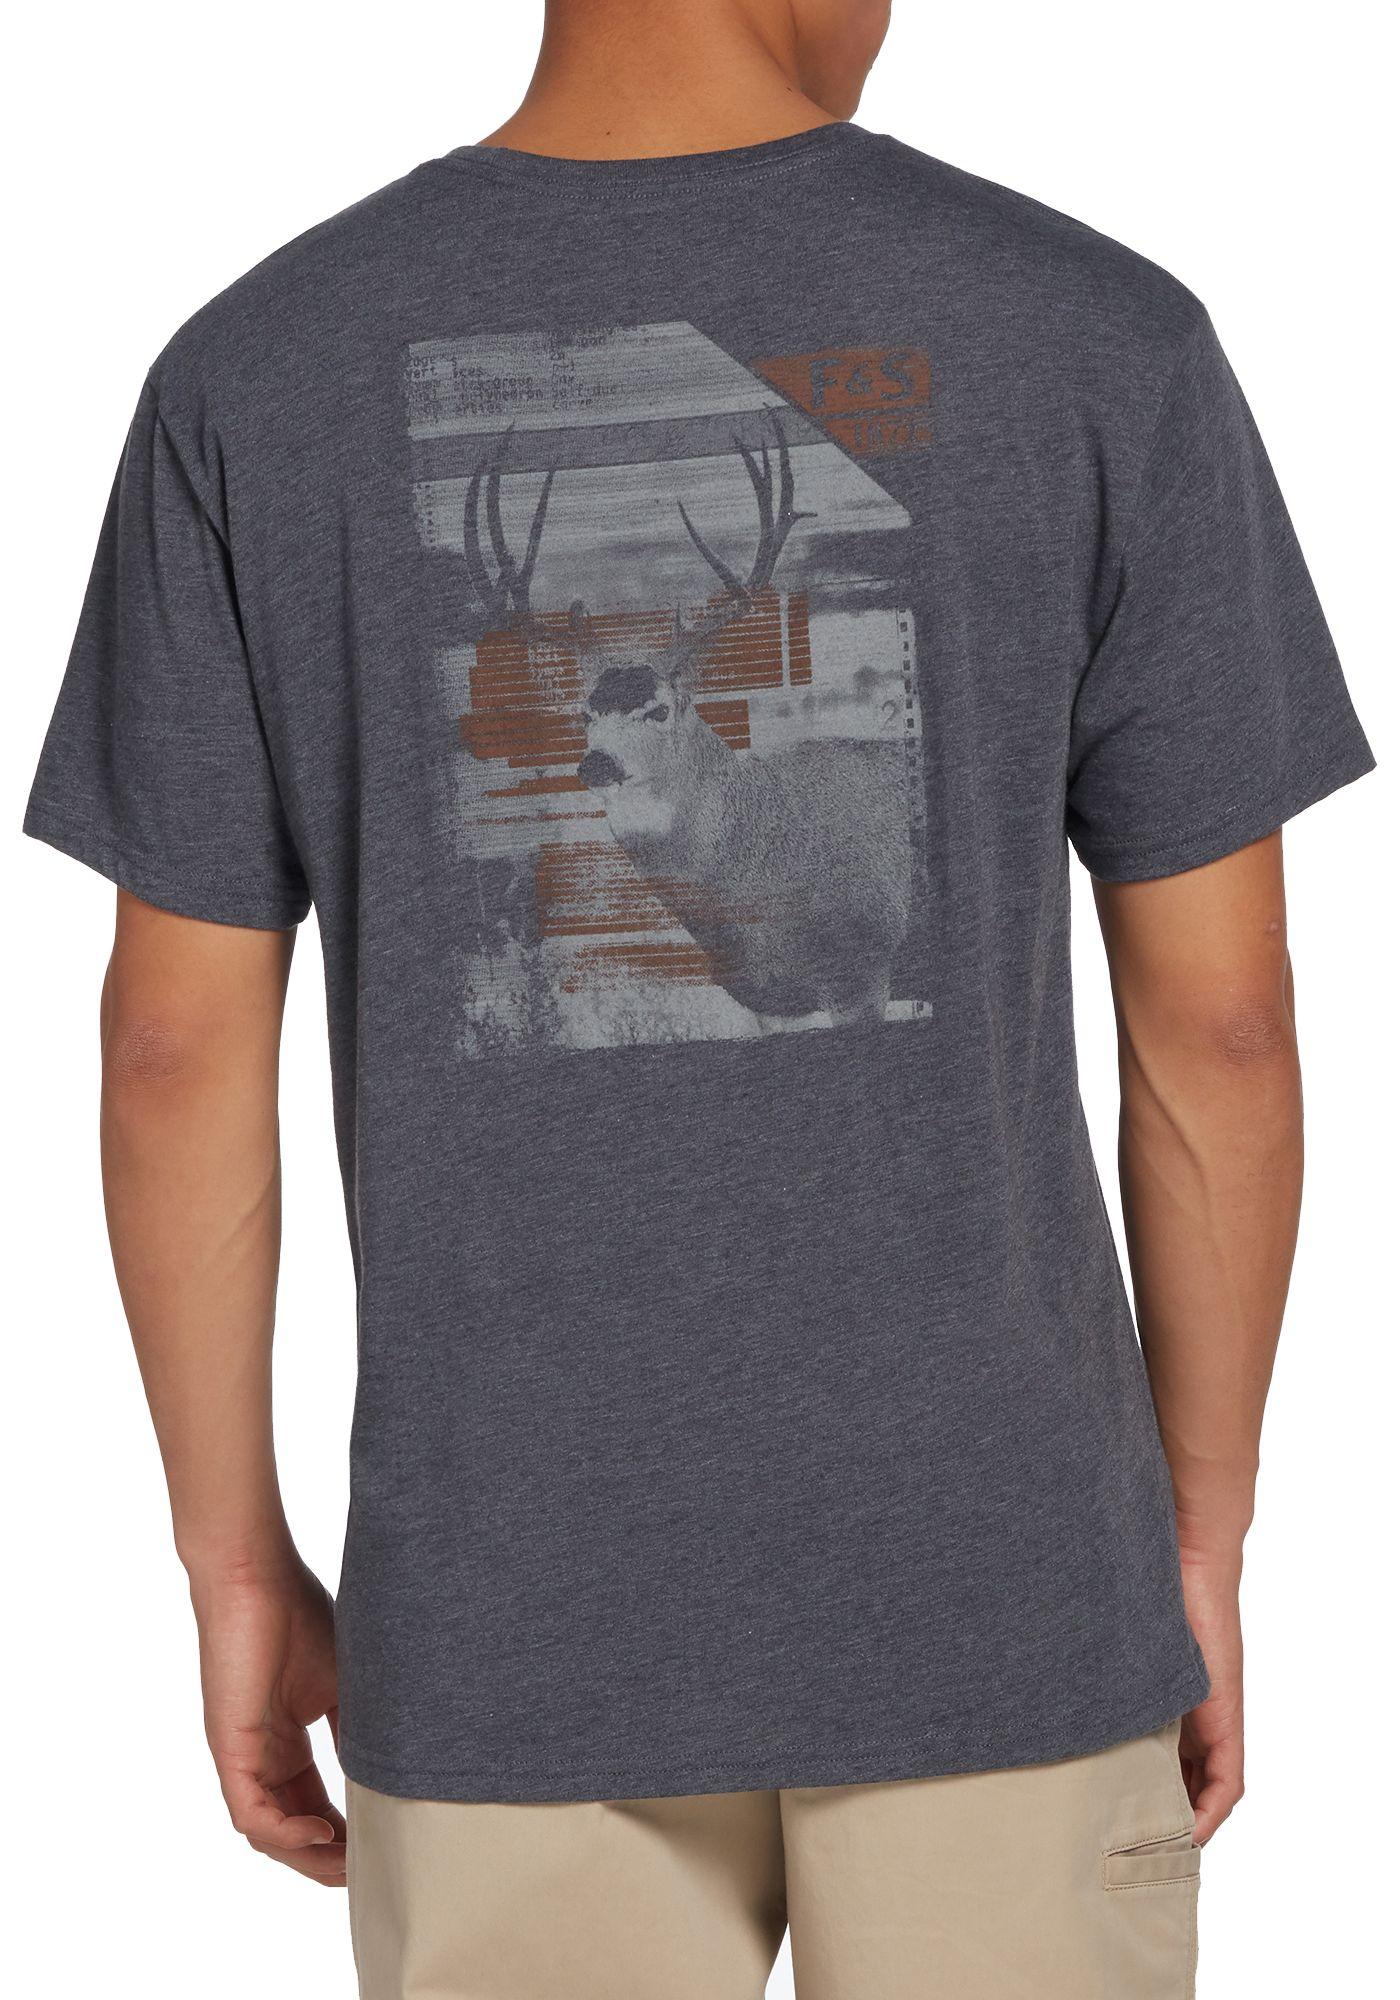 Field & Stream Men's Graphic T-Shirt